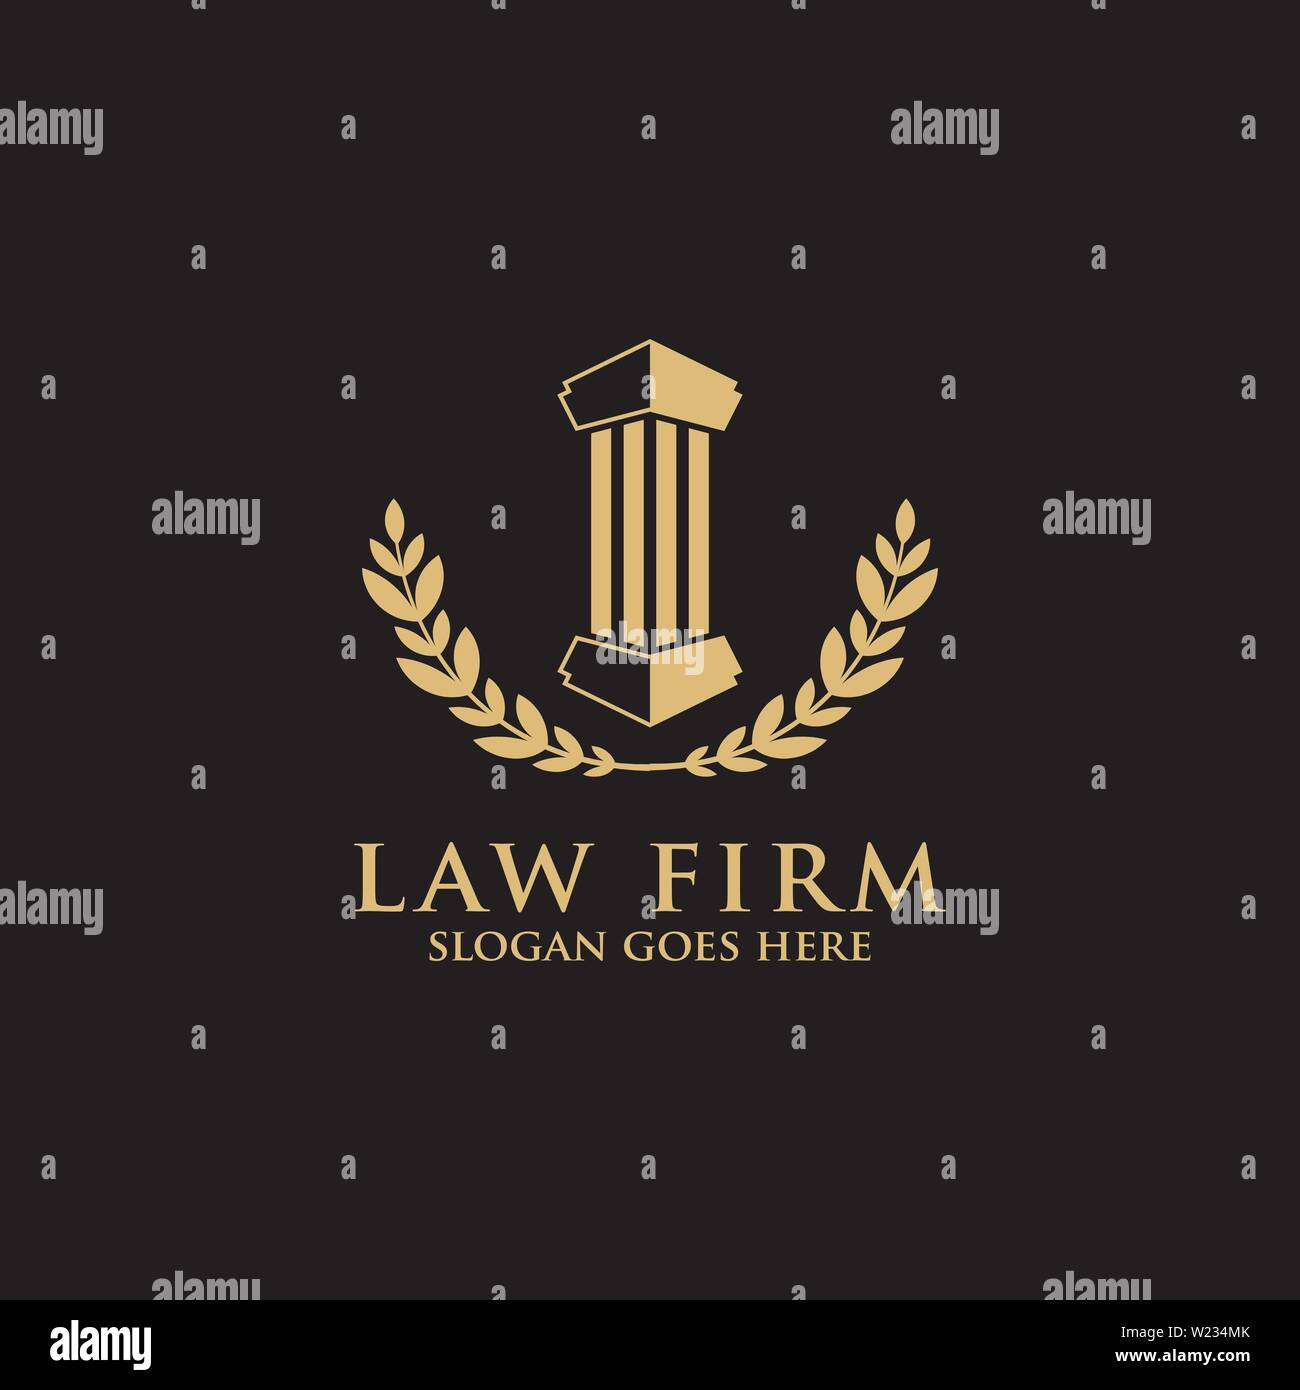 elegance law firm logo design template Stock Vector Art